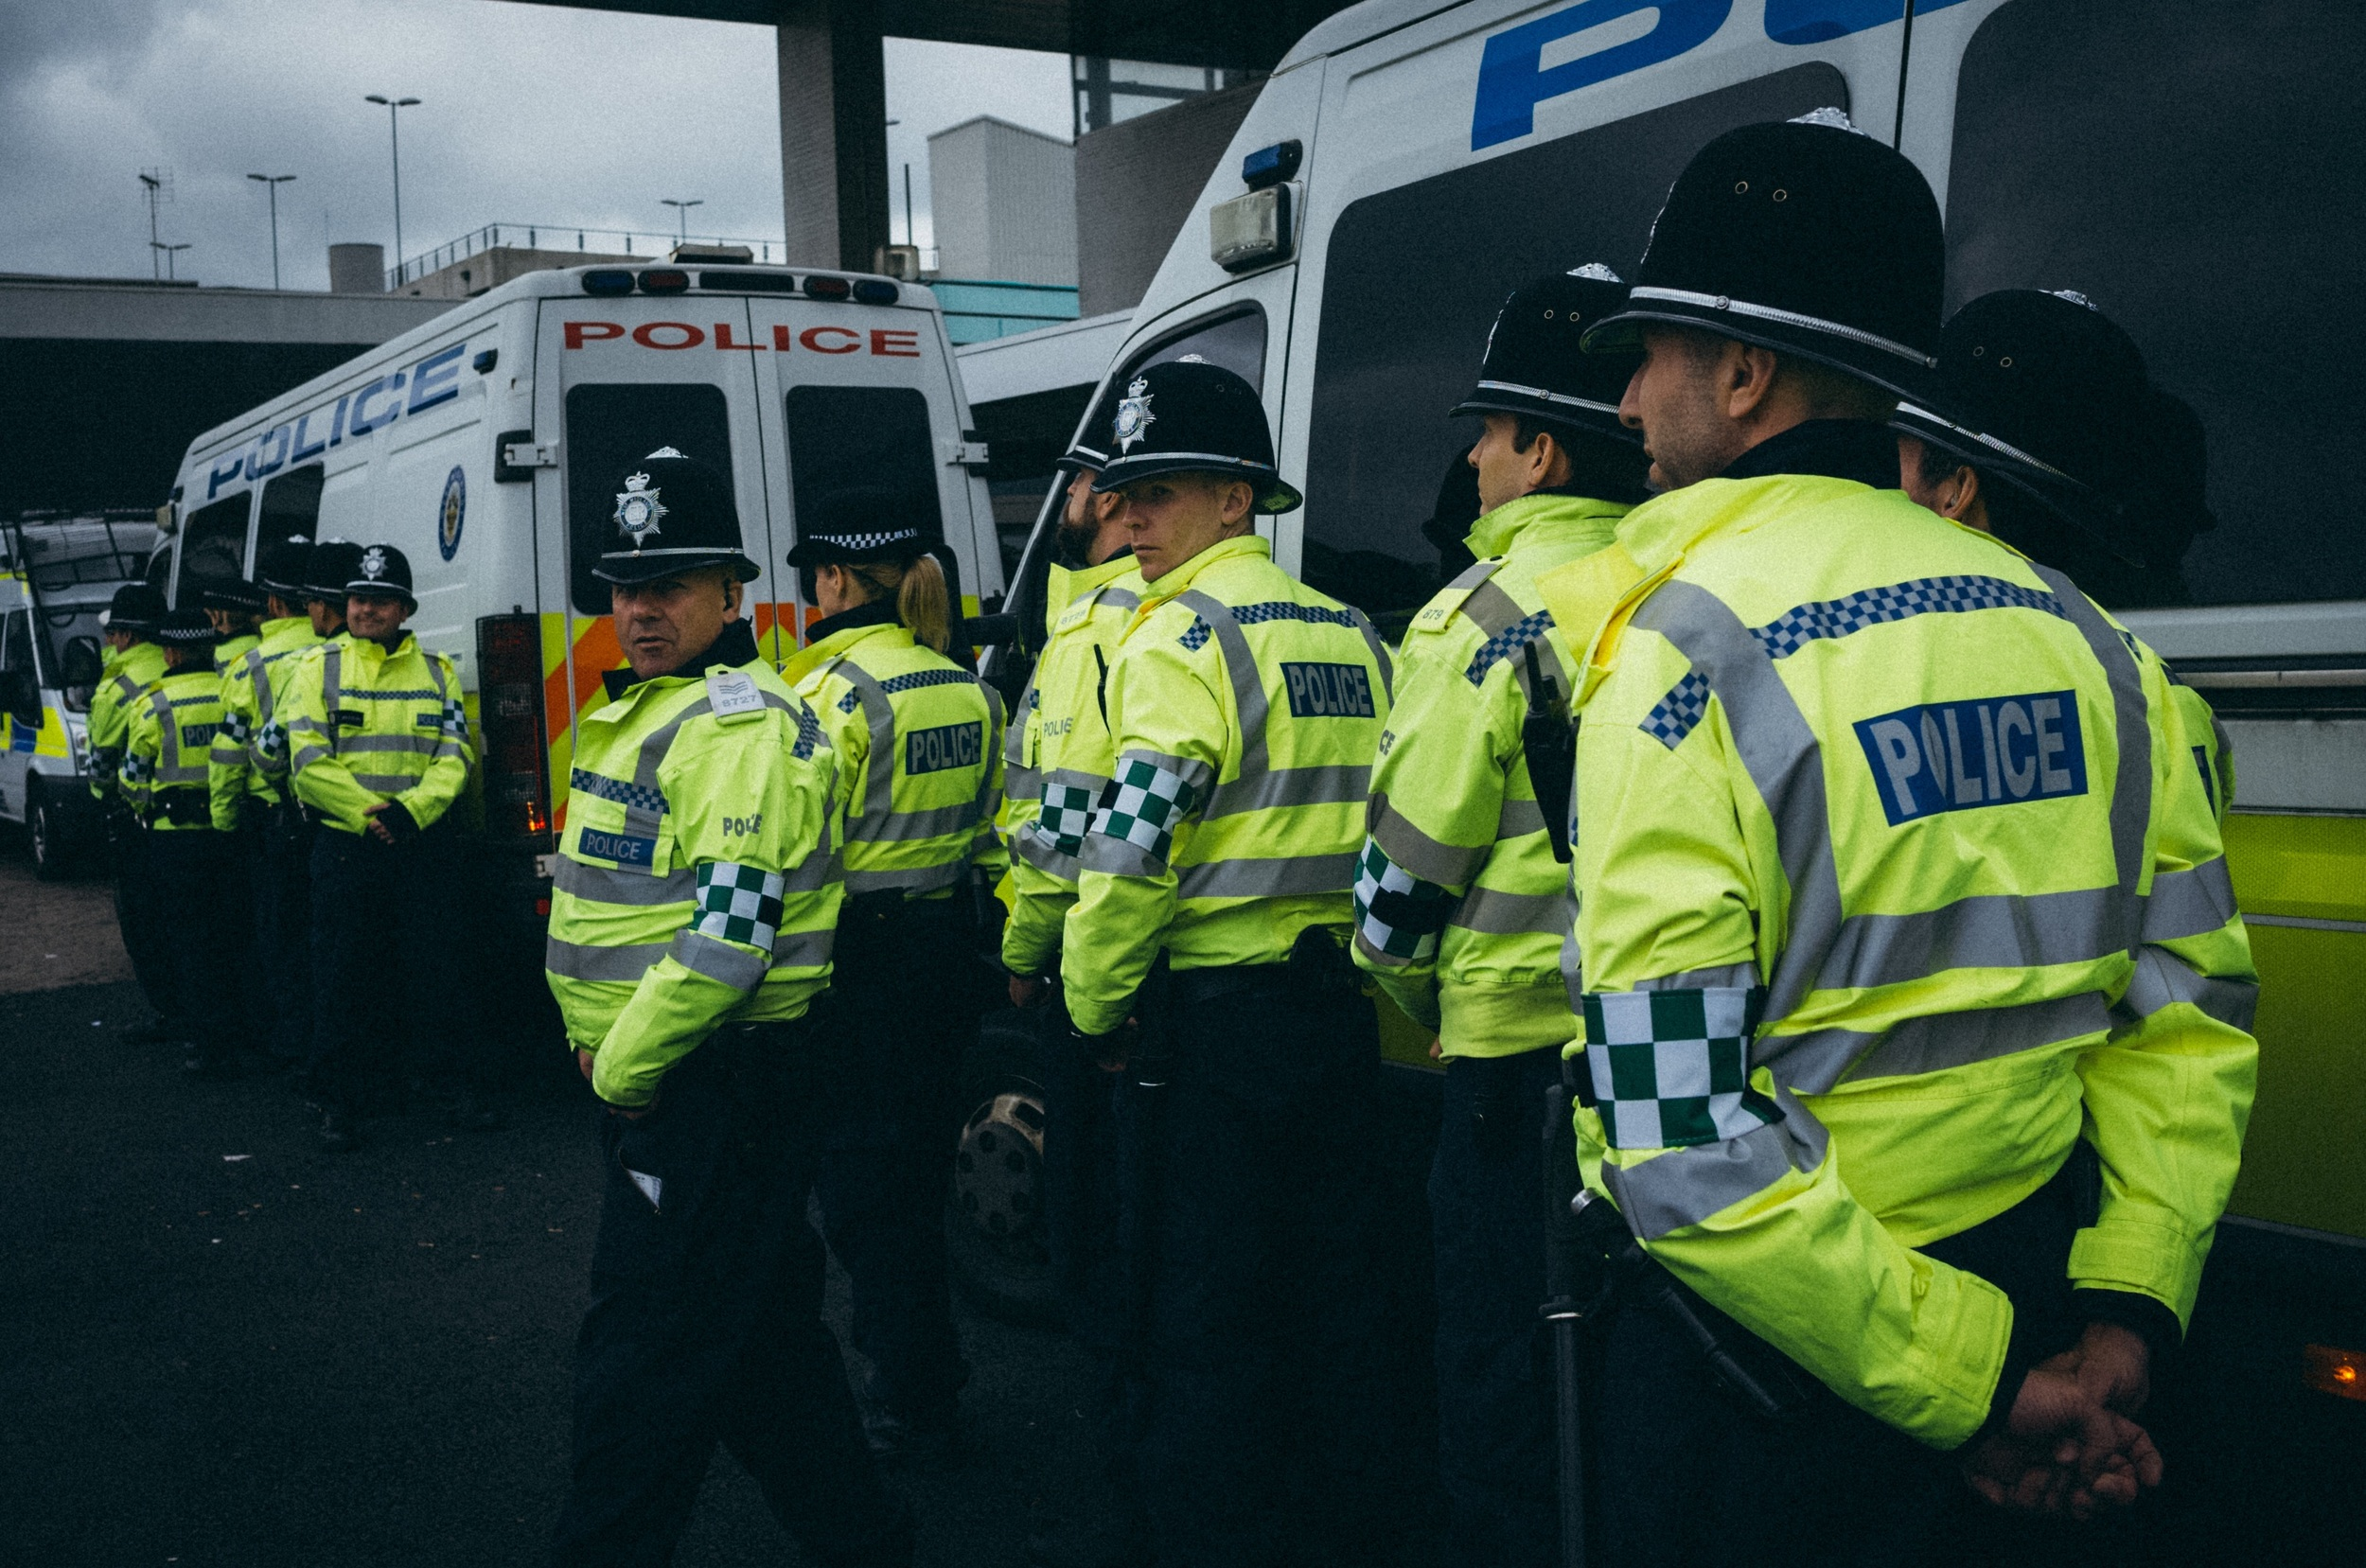 Police Presence - Clifford Darby 2016